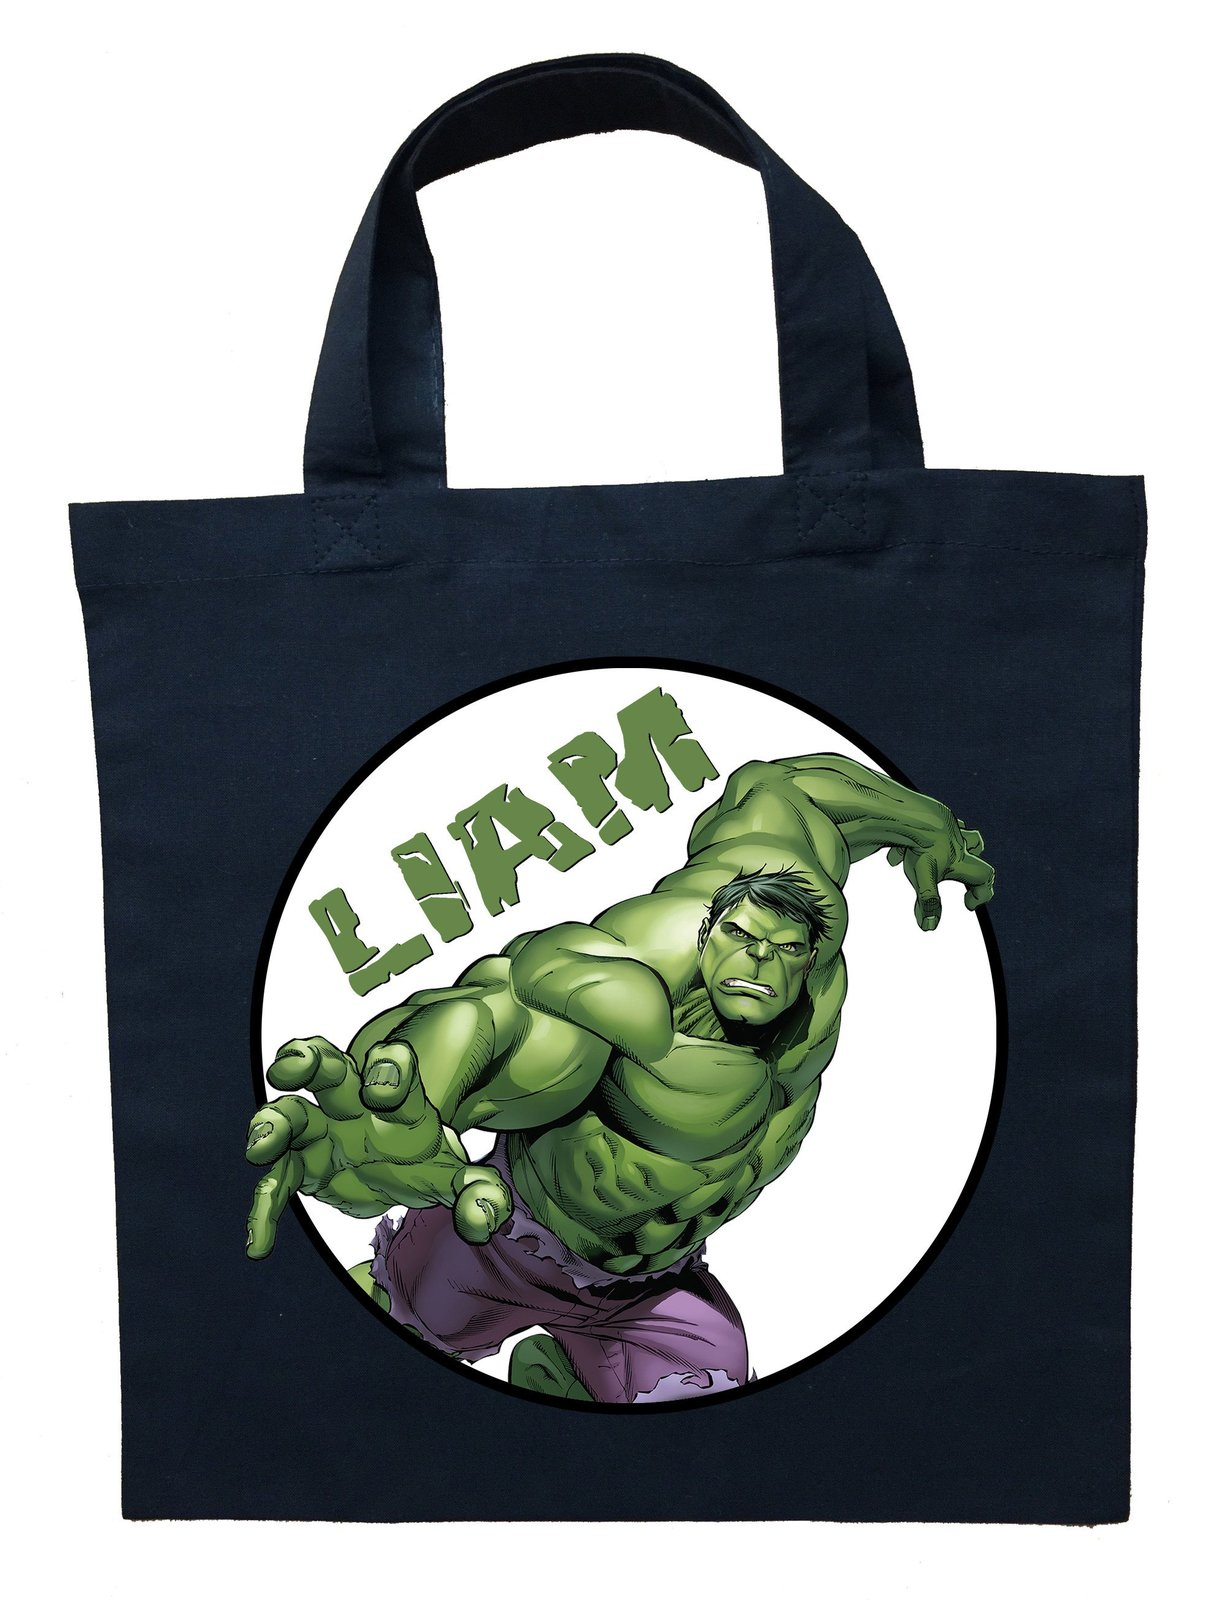 Hulkfront